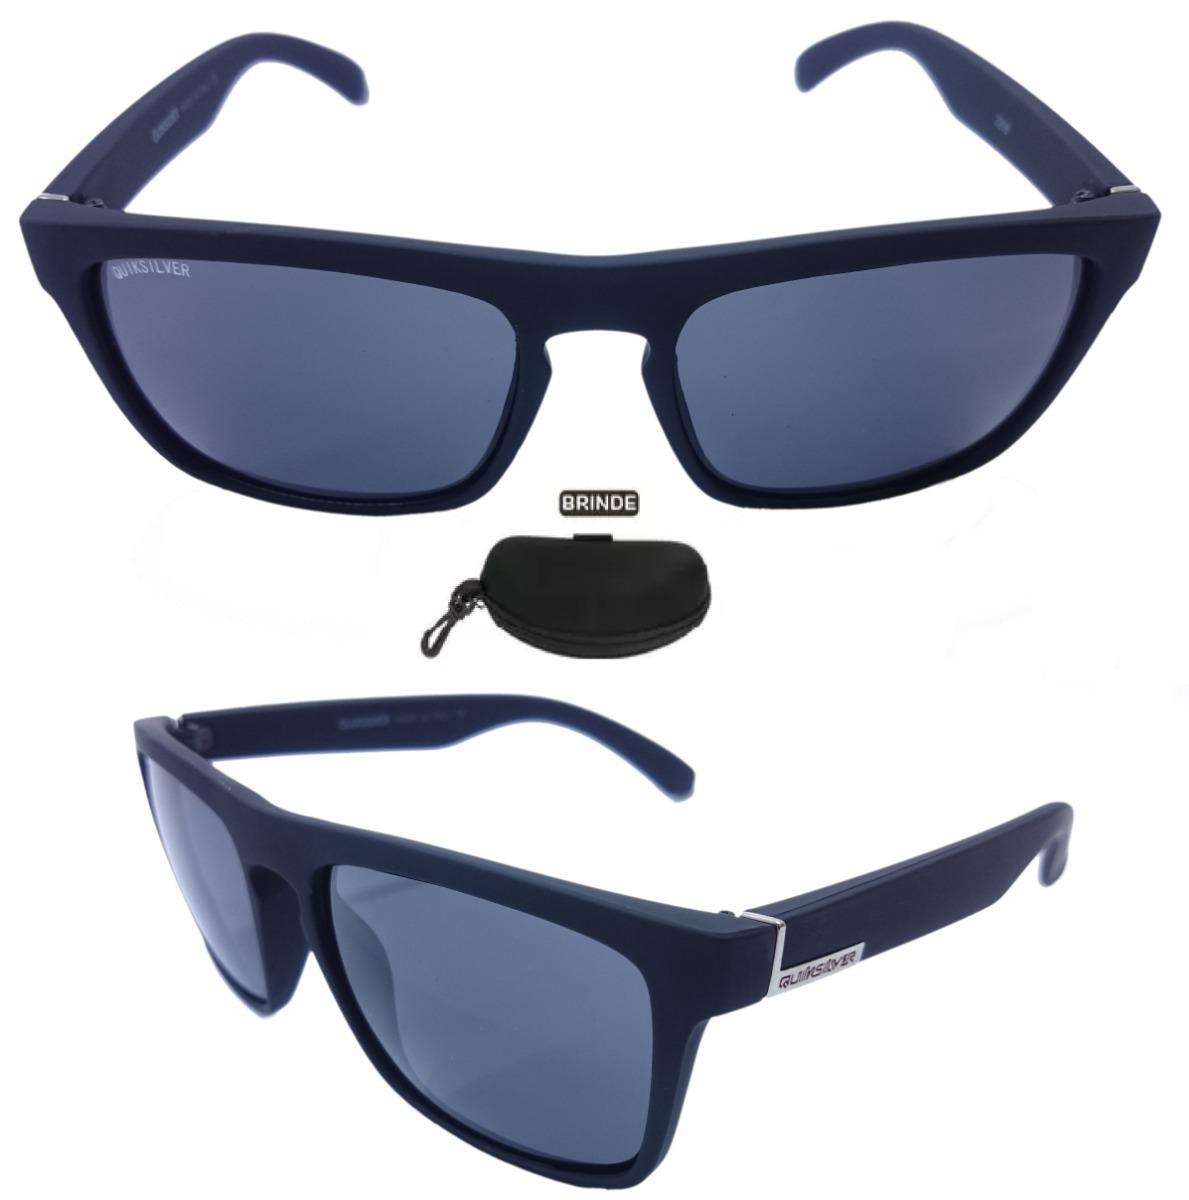 c25ad6c4c5327 Óculos De Sol Quiksilver Masculino Proteção Uv400 The Ferris - R ...